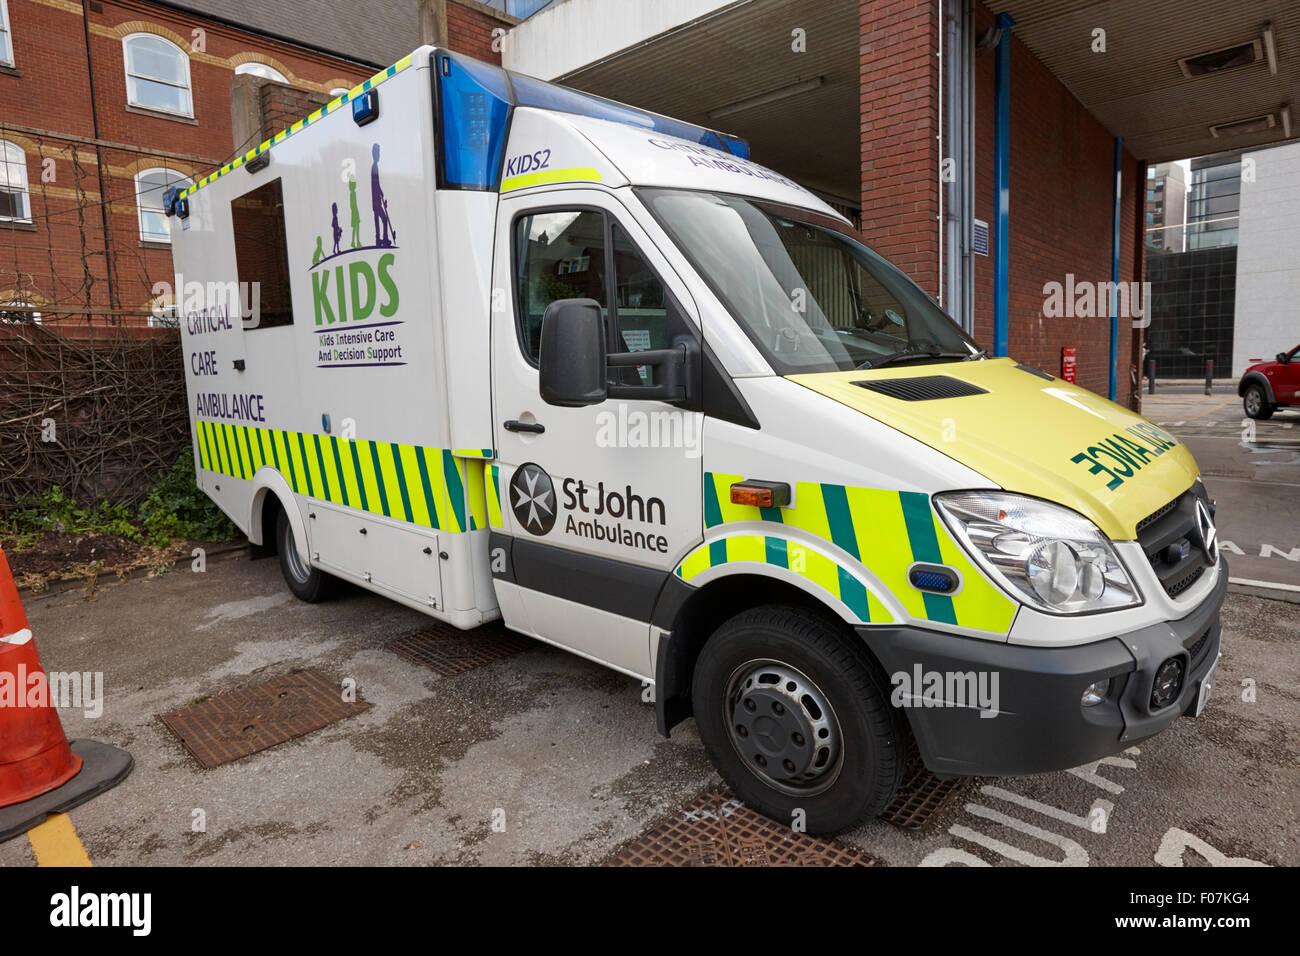 st johns ambulance kids critical care ambulance Birmingham UK - Stock Image